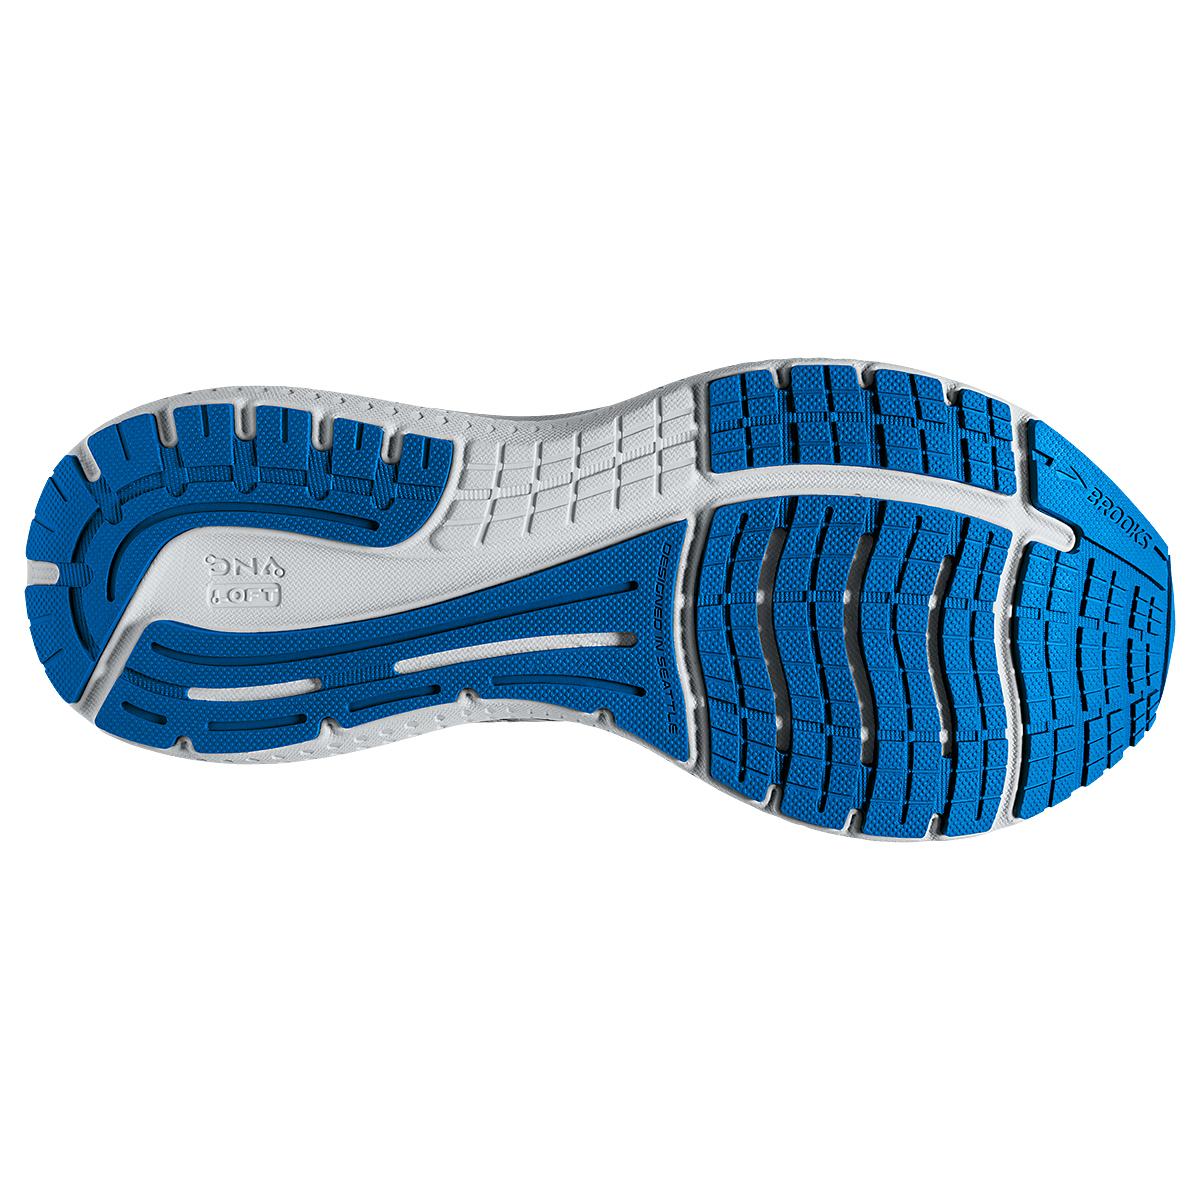 Men's Brooks Glycerin 19 Running Shoe - Color: Quarry/Grey/Dark - Size: 7 - Width: Regular, Quarry/Grey/Dark, large, image 3